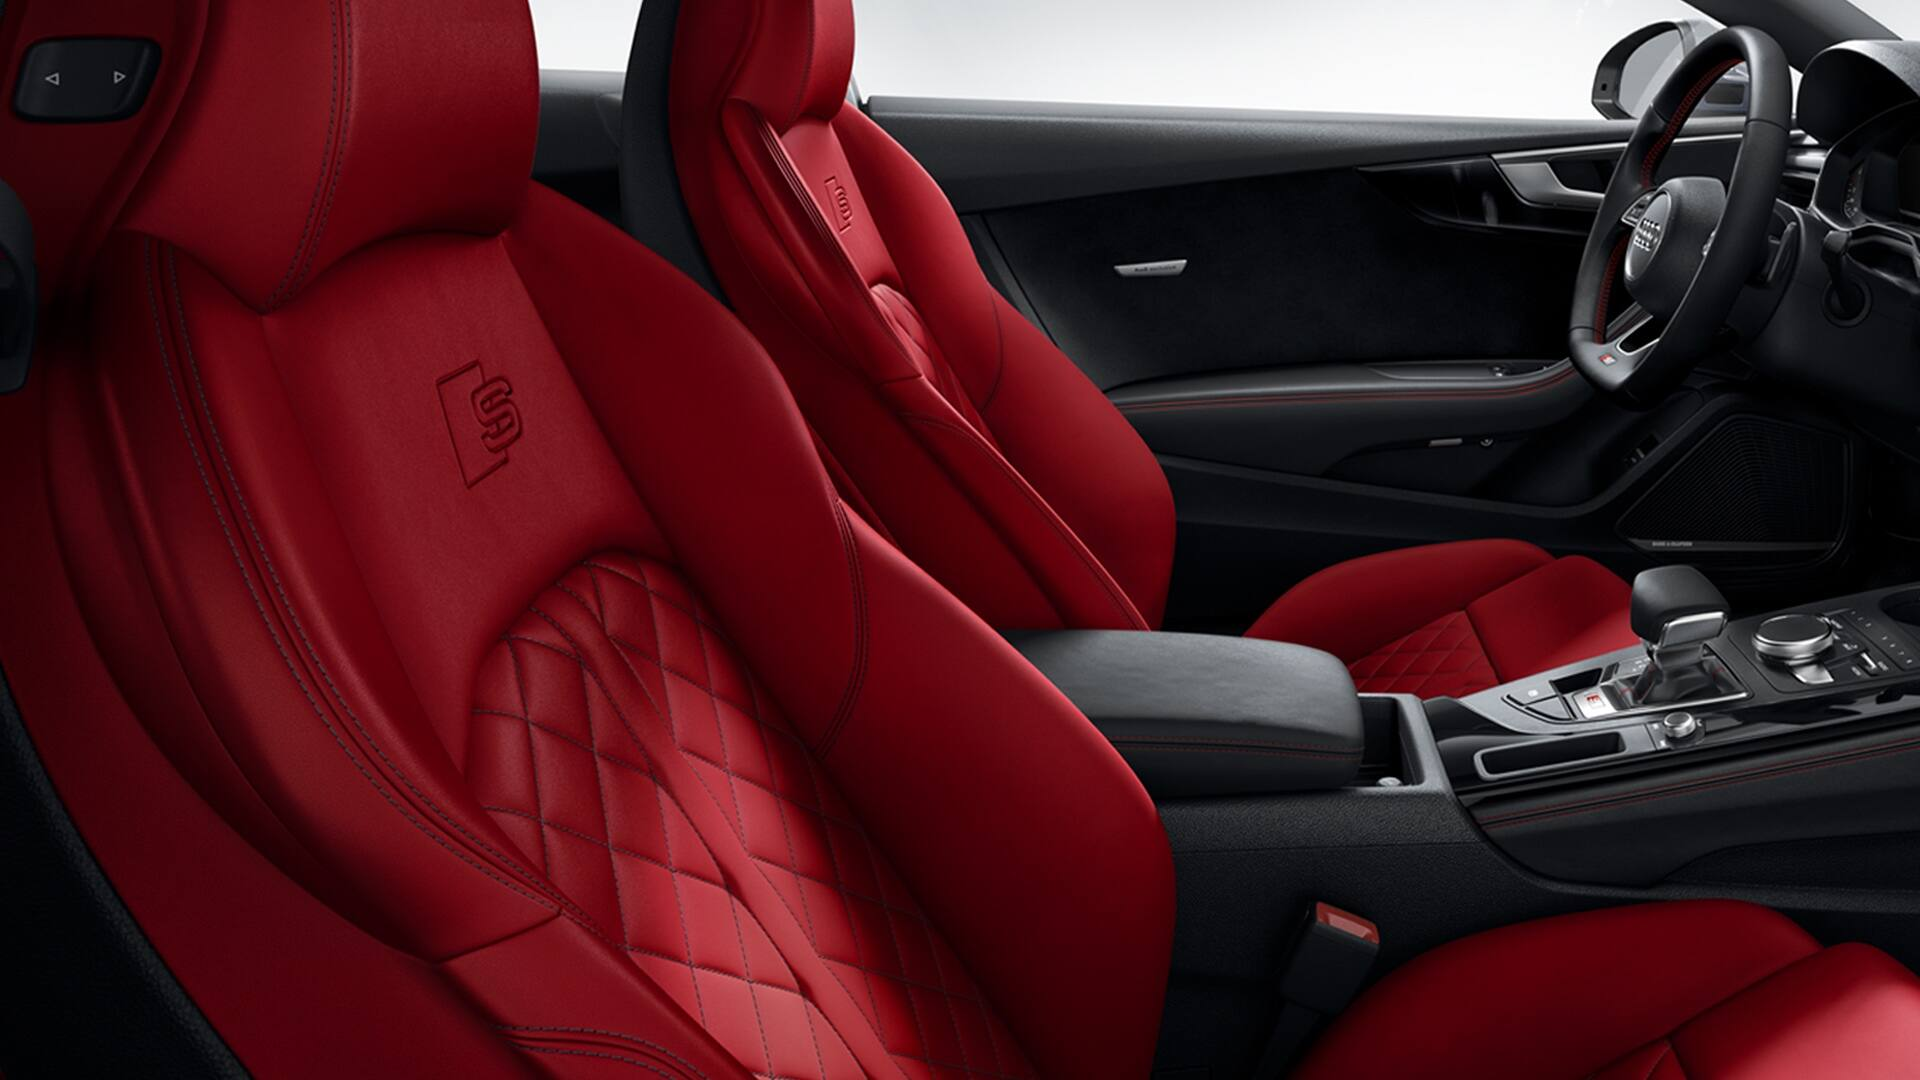 A5 Interieur > A5 Sportback 2018 > A5 > Audi Deutschland